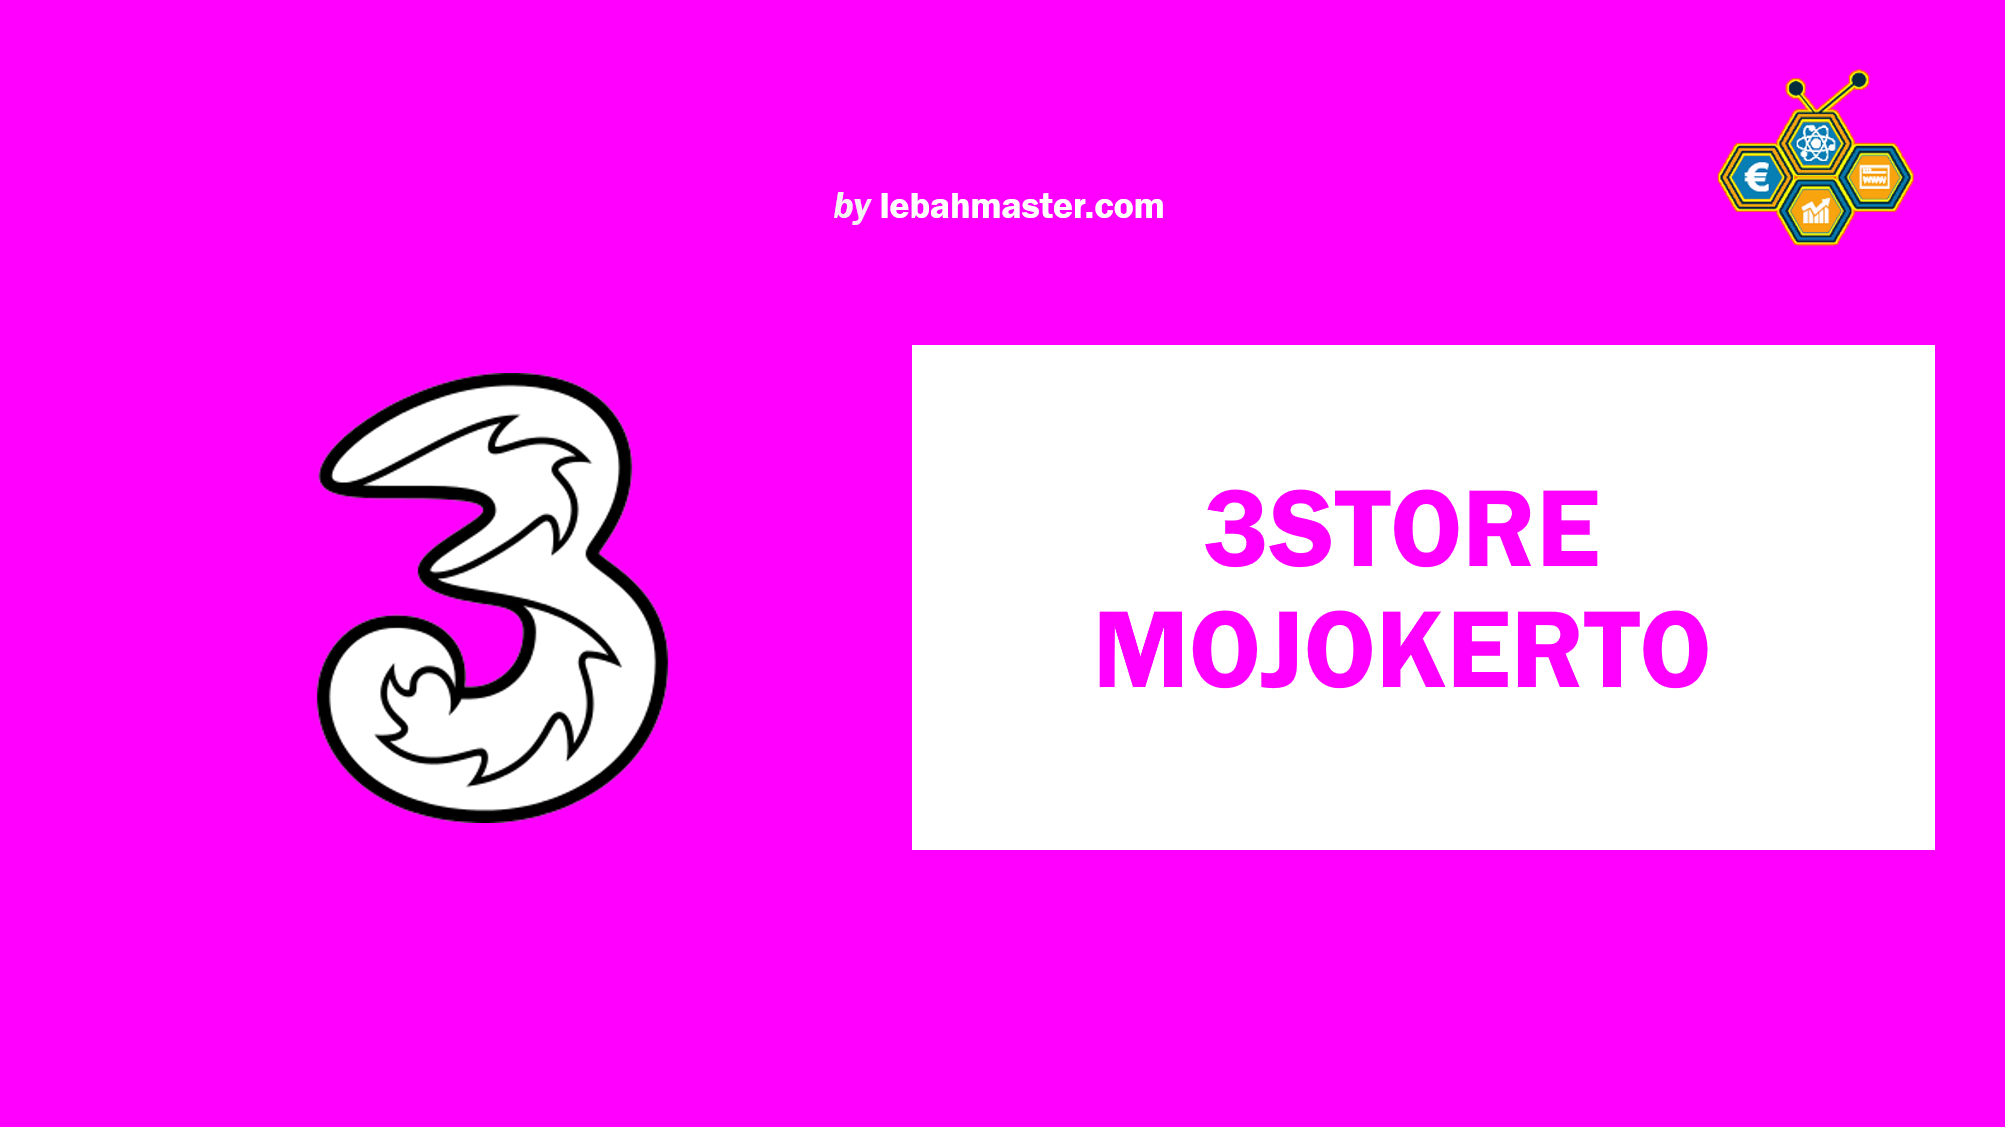 3 Store Mojokerto